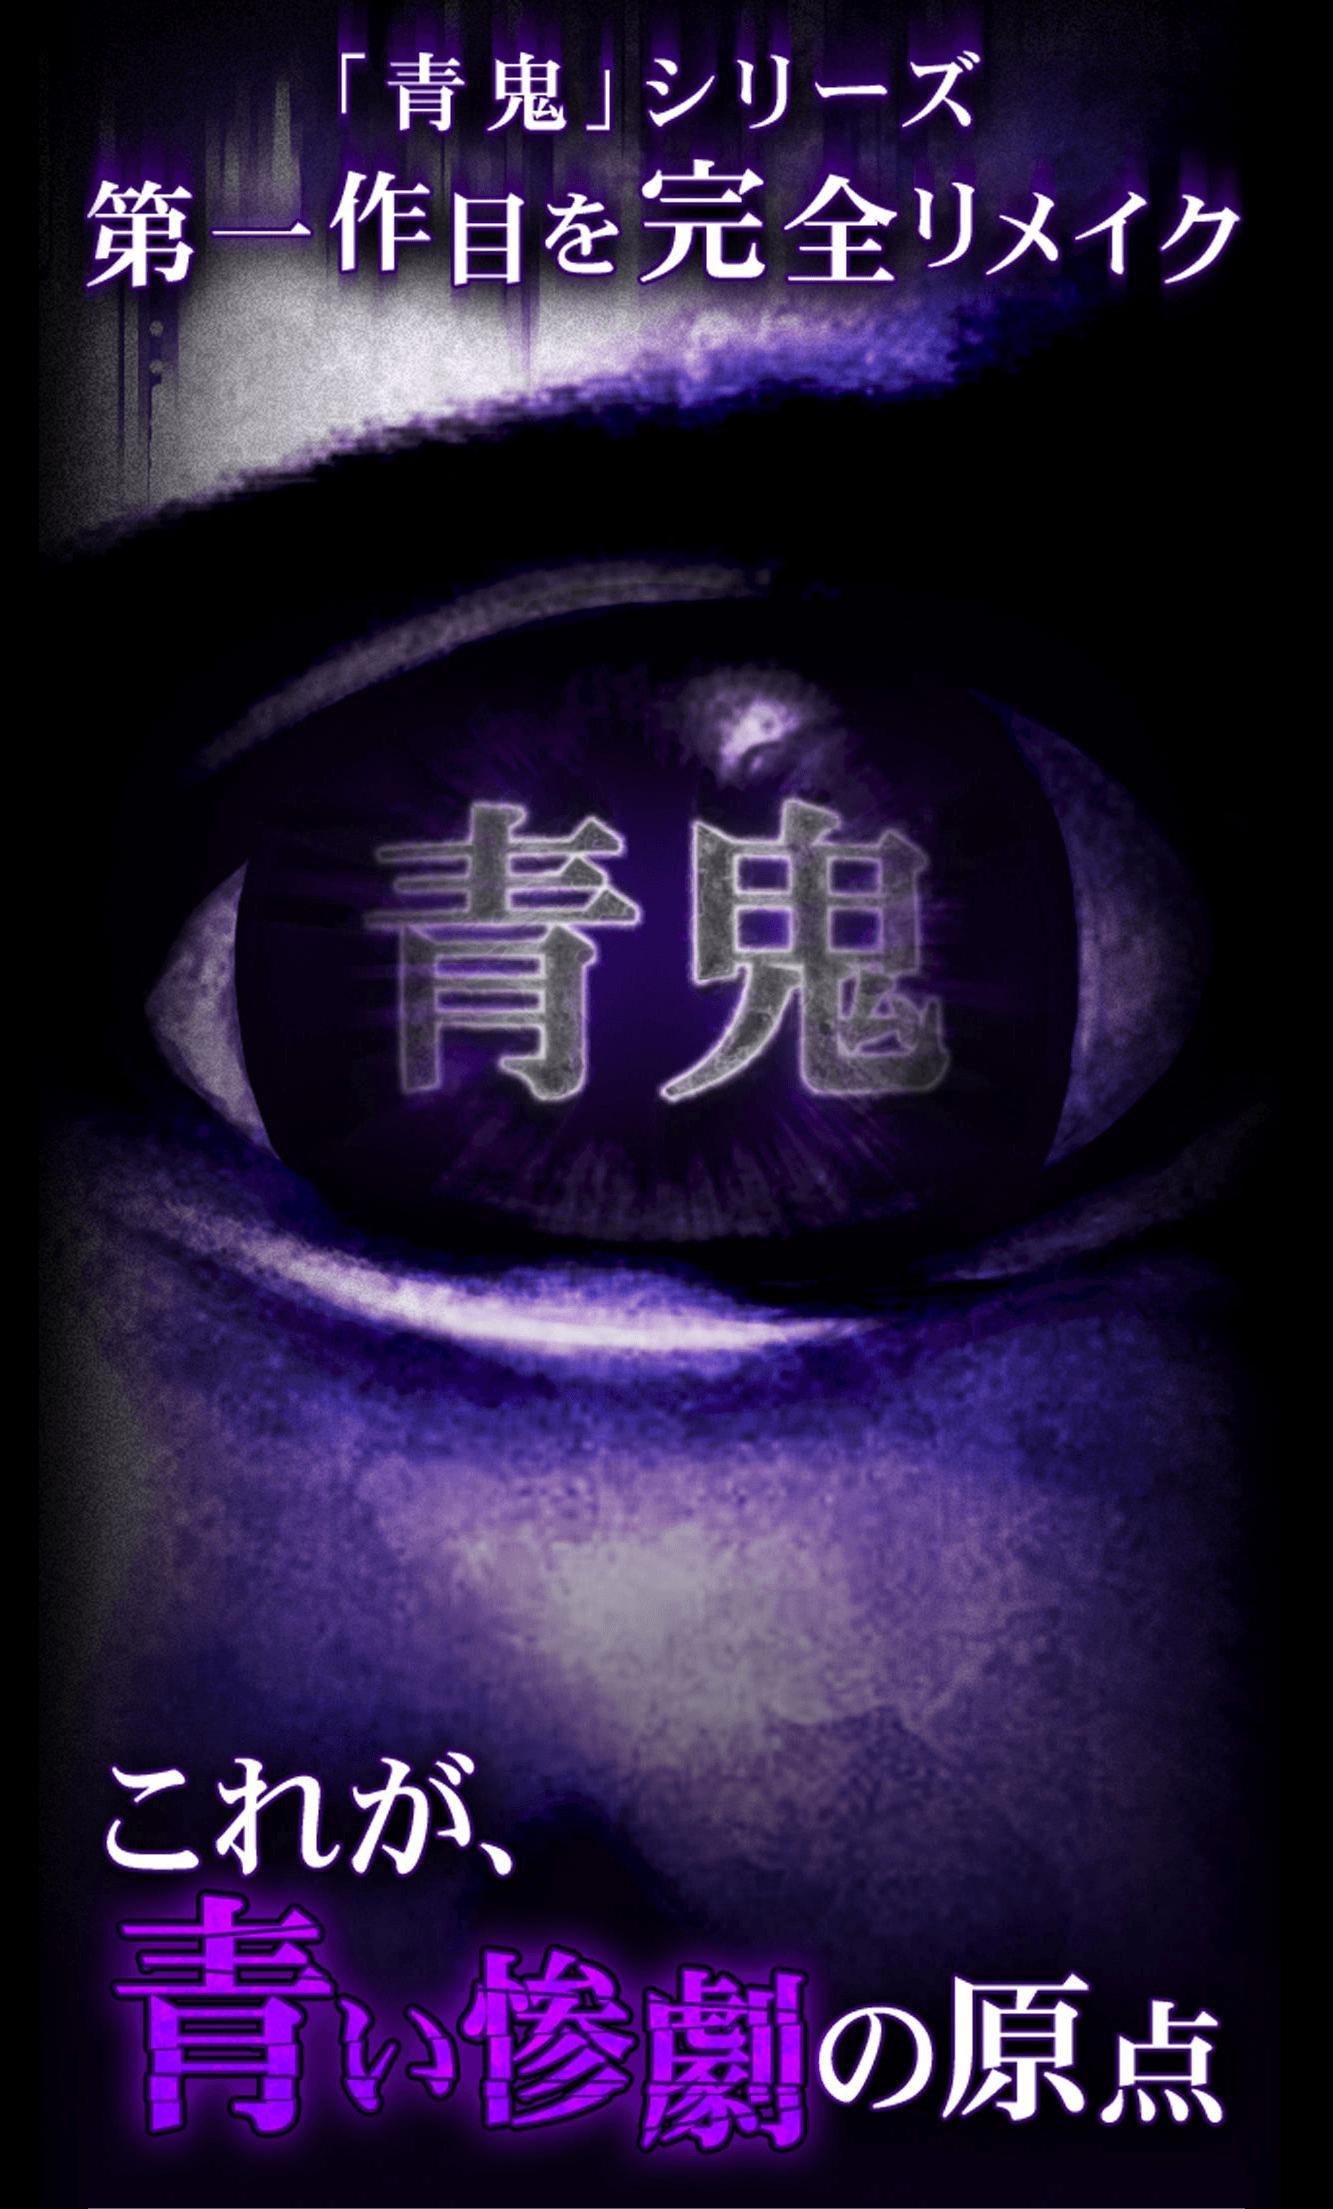 青鬼 Uuum株式会社ウーム株式会社